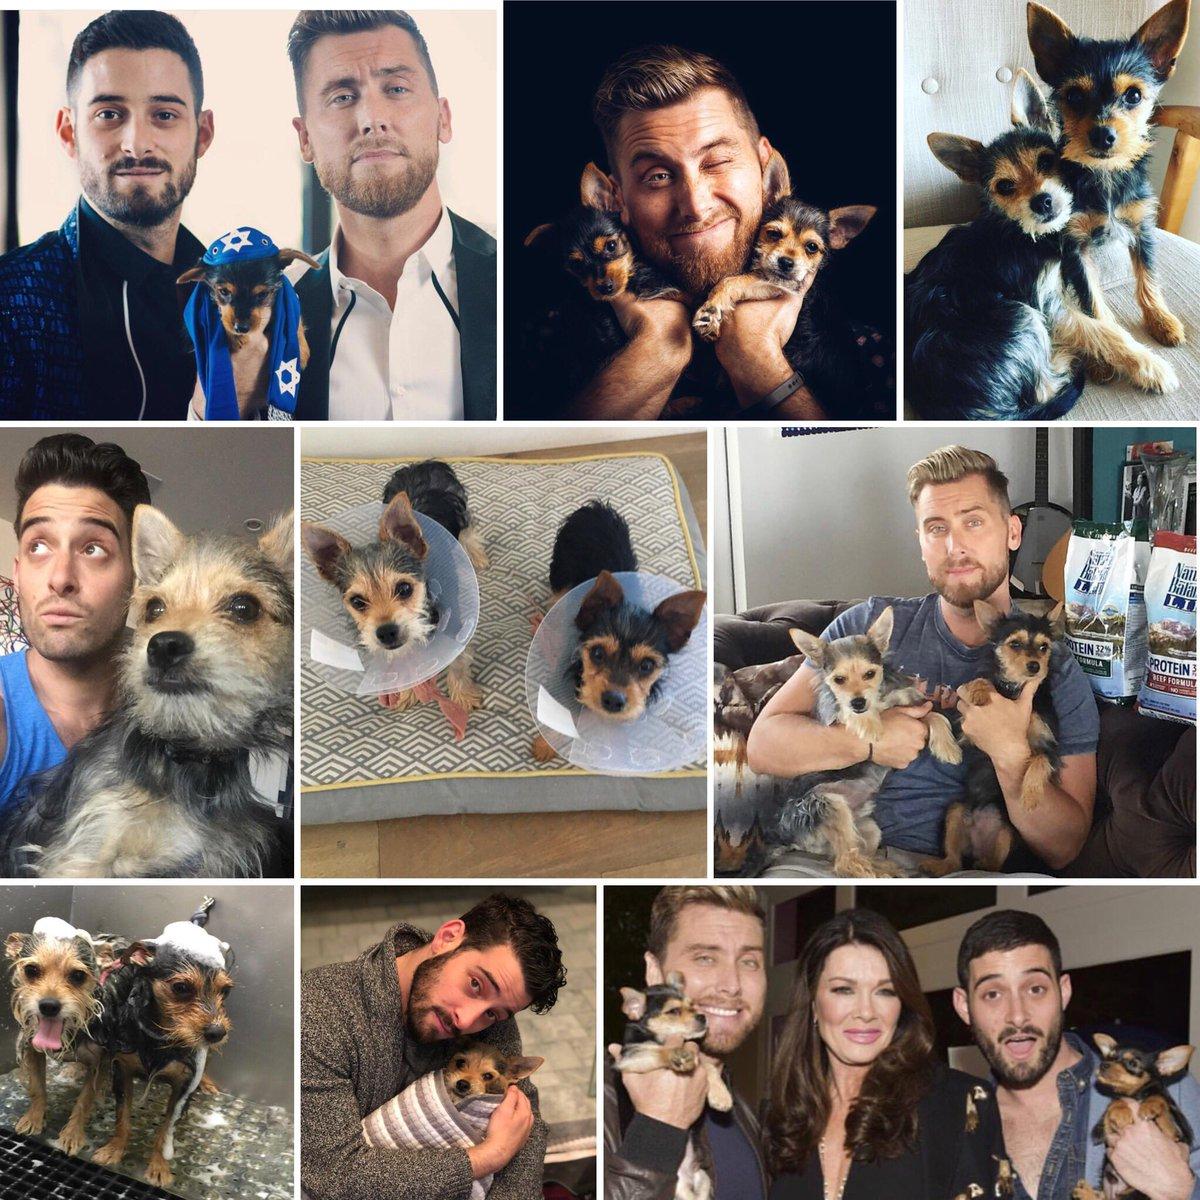 RT @BassTurchNsquad: Happy #NationalPuppyDay to @LanceBass & @MichaelTurchin's pups Chip and Dale! ???? https://t.co/jvtDrEvBIQ